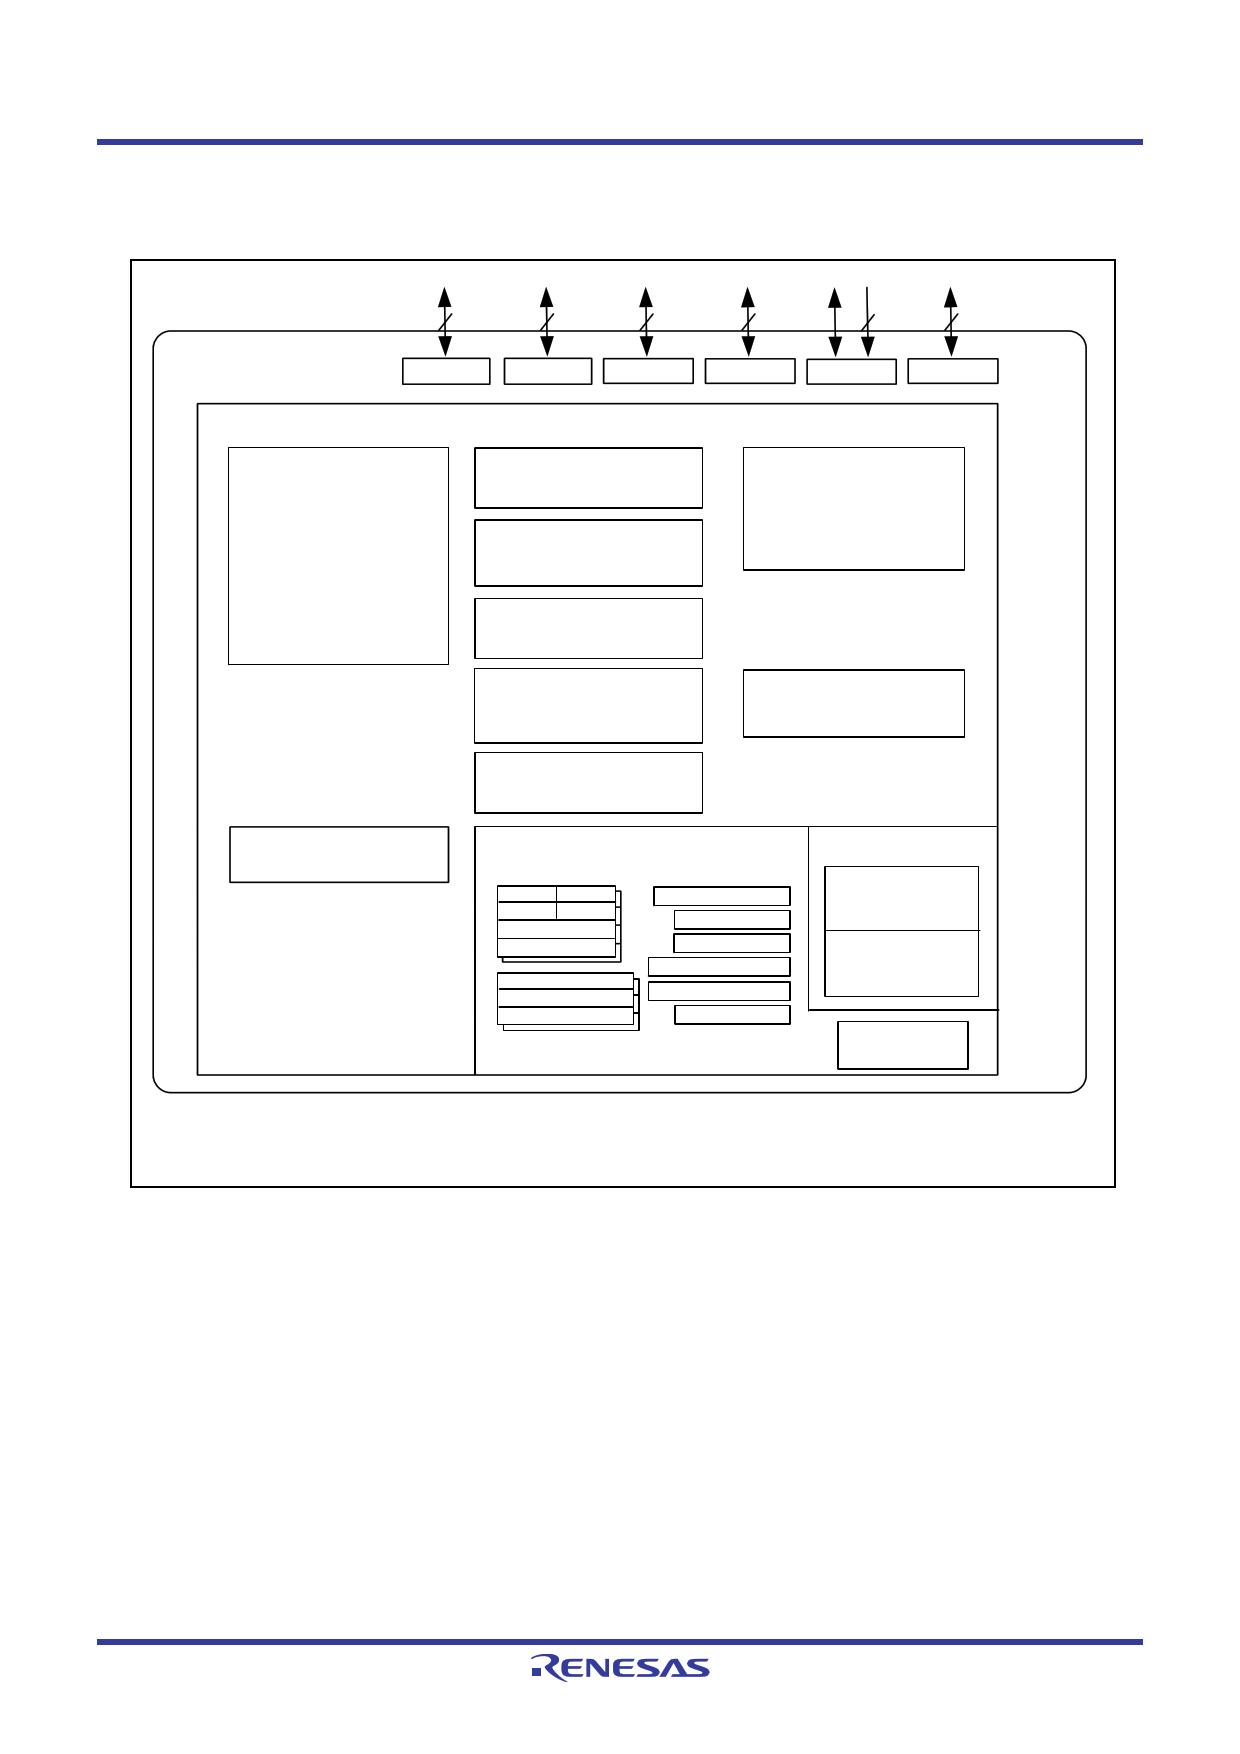 R5F21228KFP pdf, 반도체, 판매, 대치품